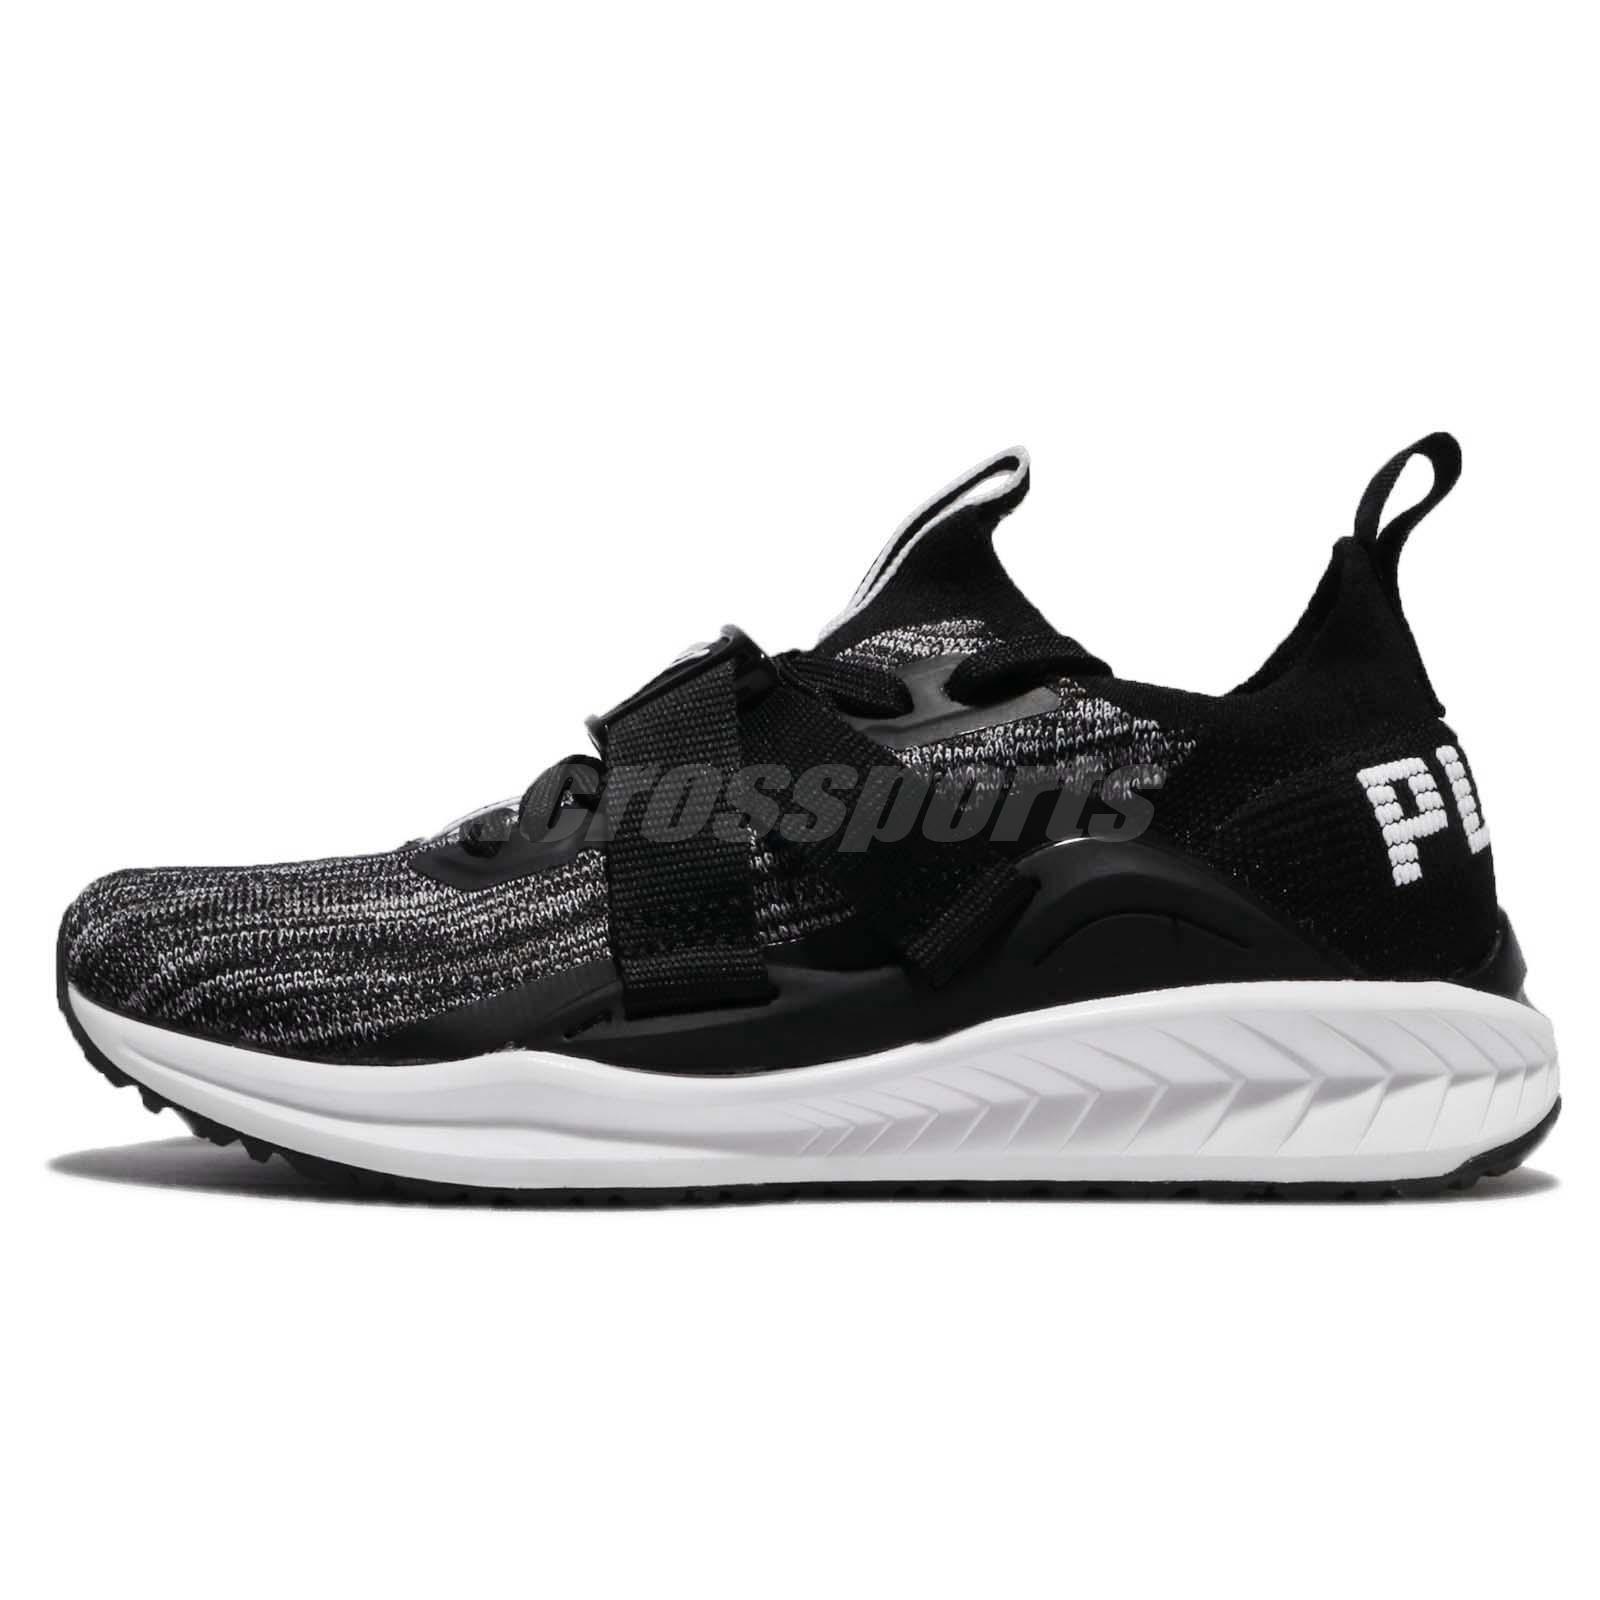 7a194dff4a1b18 Puma Ignite EvoKnit Lo 2 II Black White Men Running Shoes Sneakers 190459-02